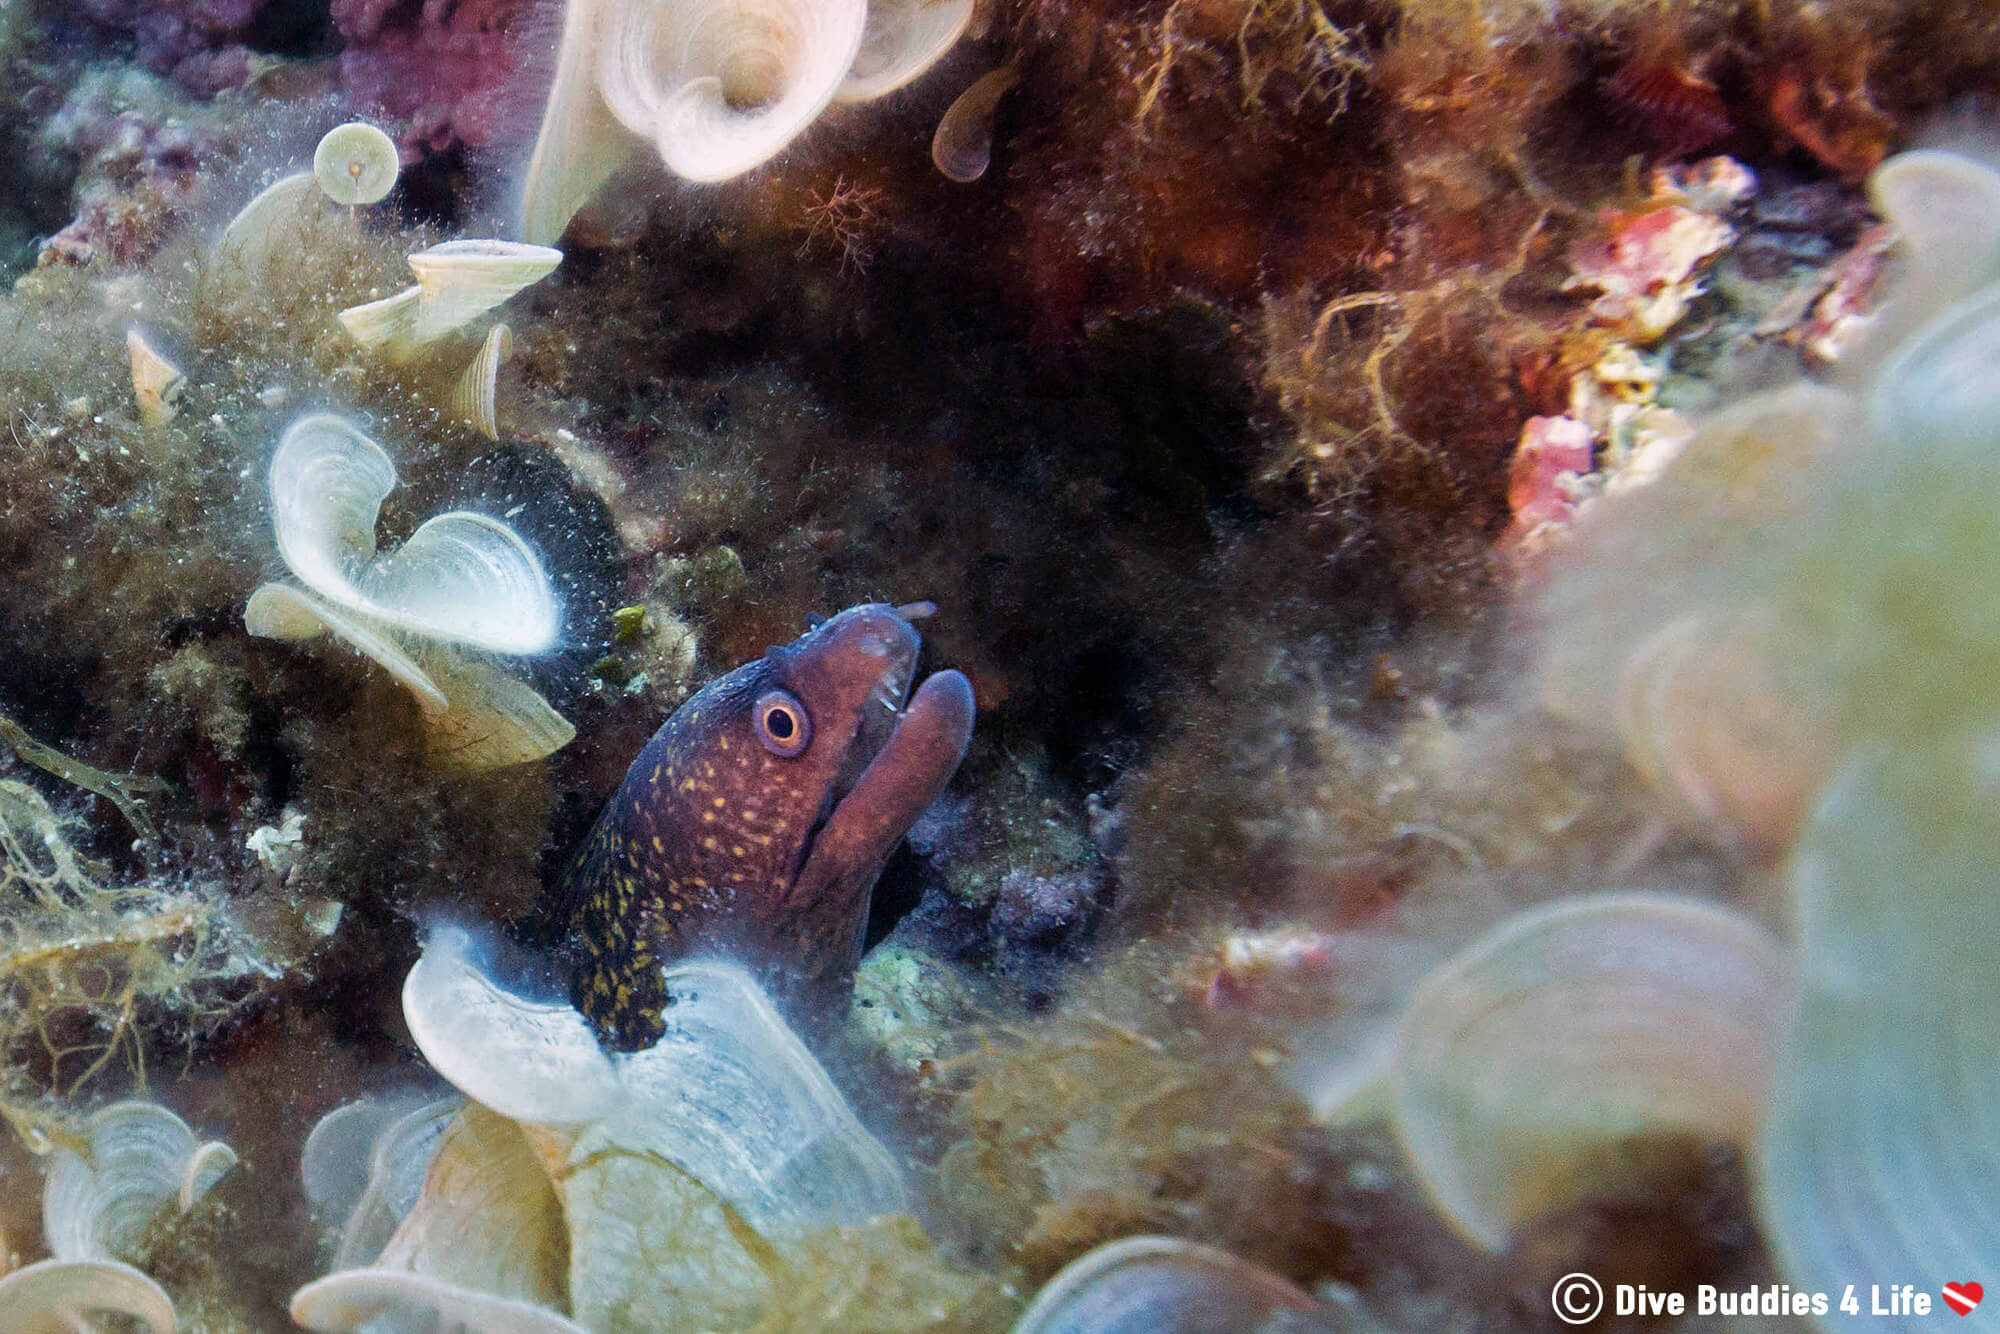 A Small Moray Eel On The Mediterranean Sea Floor In Budva Montenegro, Scuba Diving Europe's Balkan Countrie